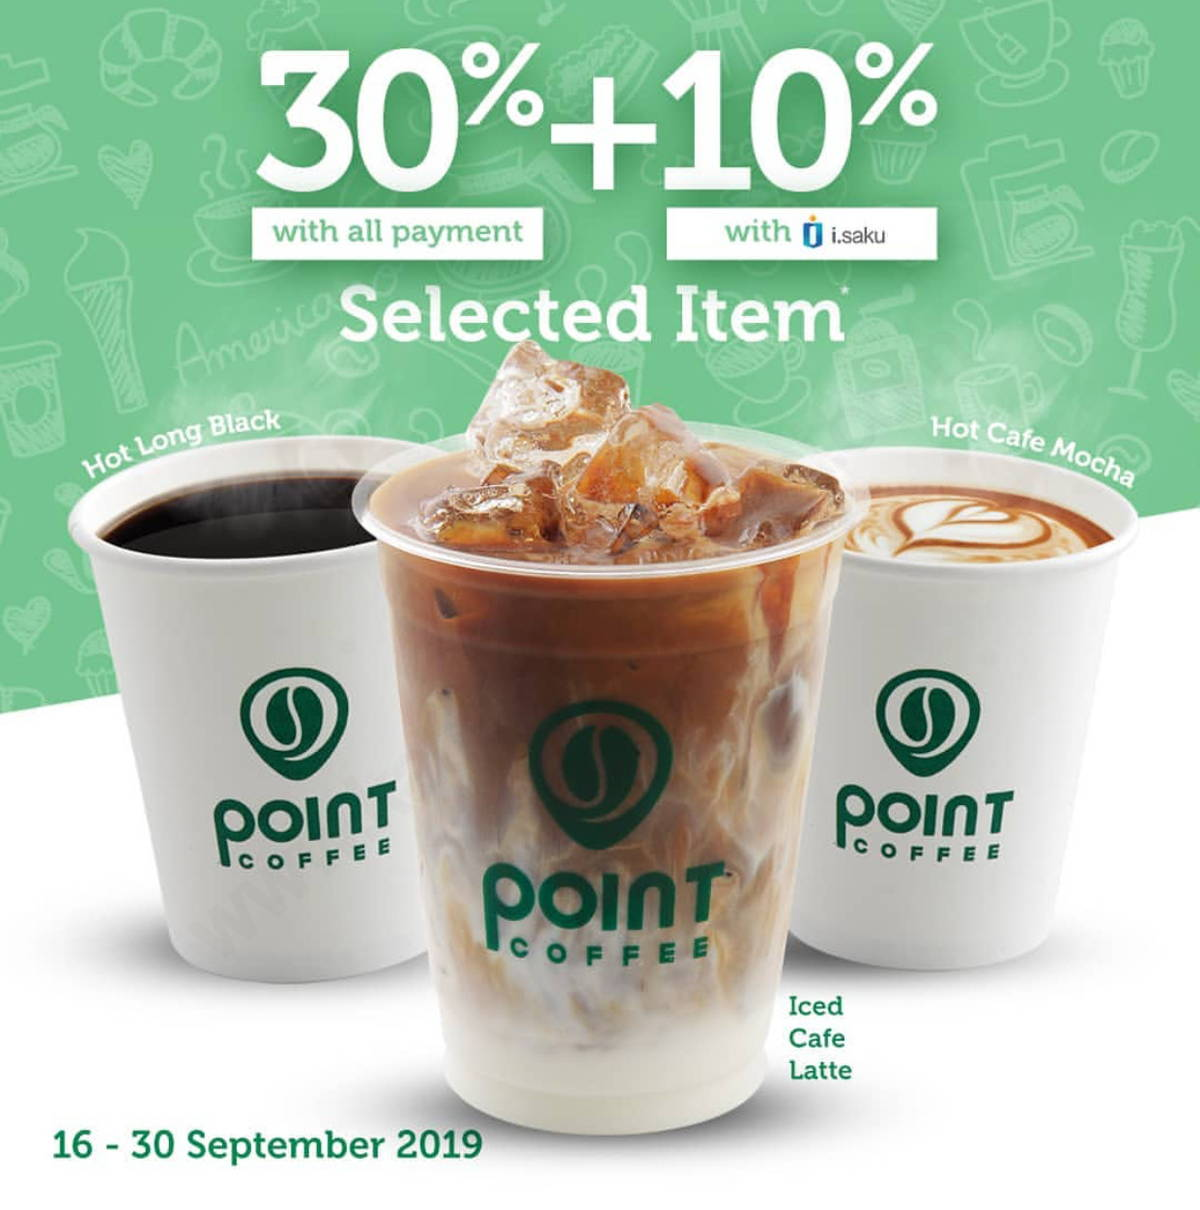 Katalog Promo: INDOMARET POINT CAFE Promo DISKON HINGGA 40% untuk produk tertentu - 1